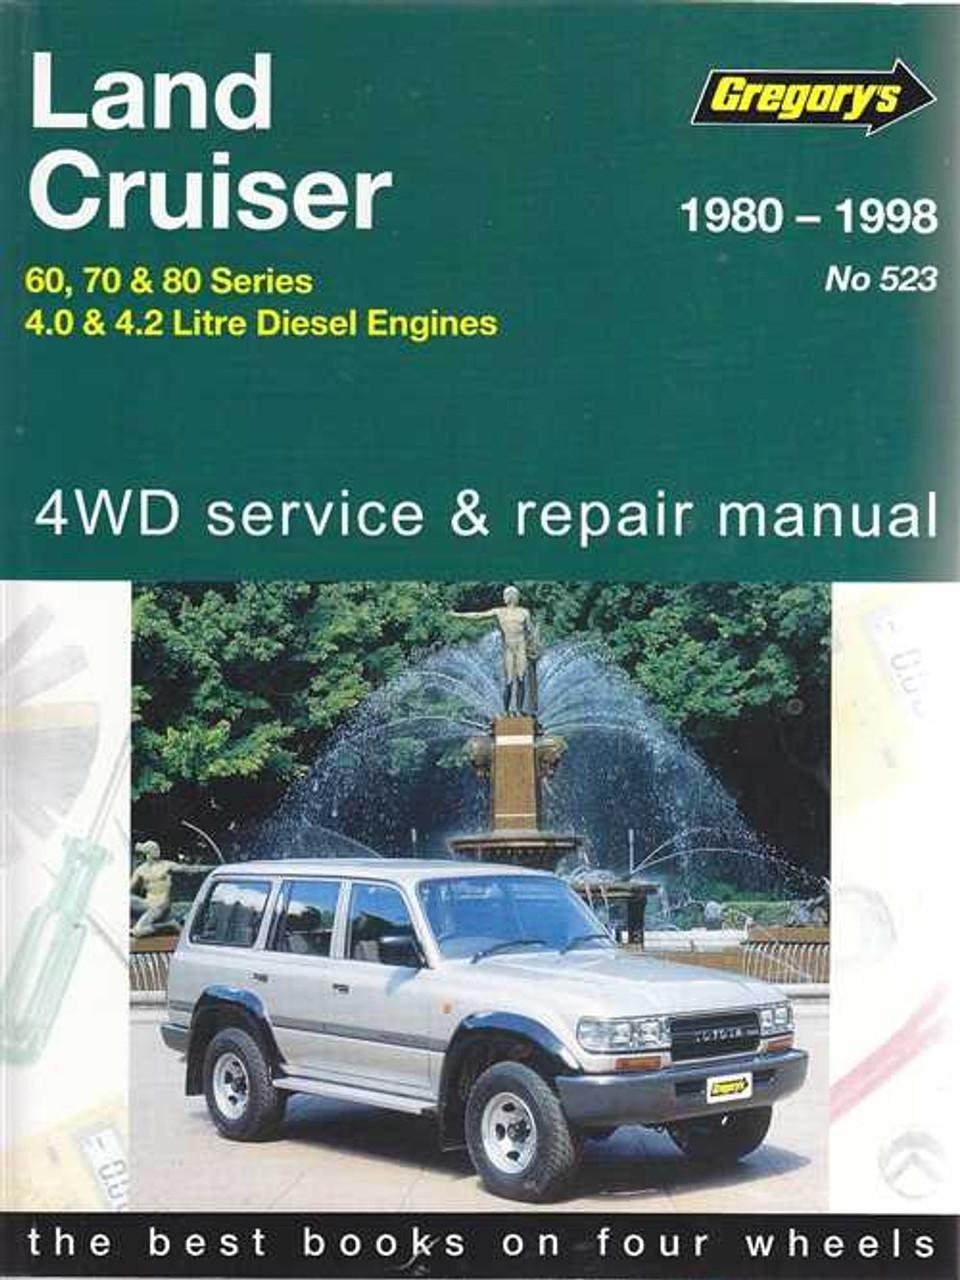 land cruiser 60 70 80 series 4 0l 4 2l diesel 1980 1998 rh automotobookshop com au Toyota T Engine 12H Toyota Hj70